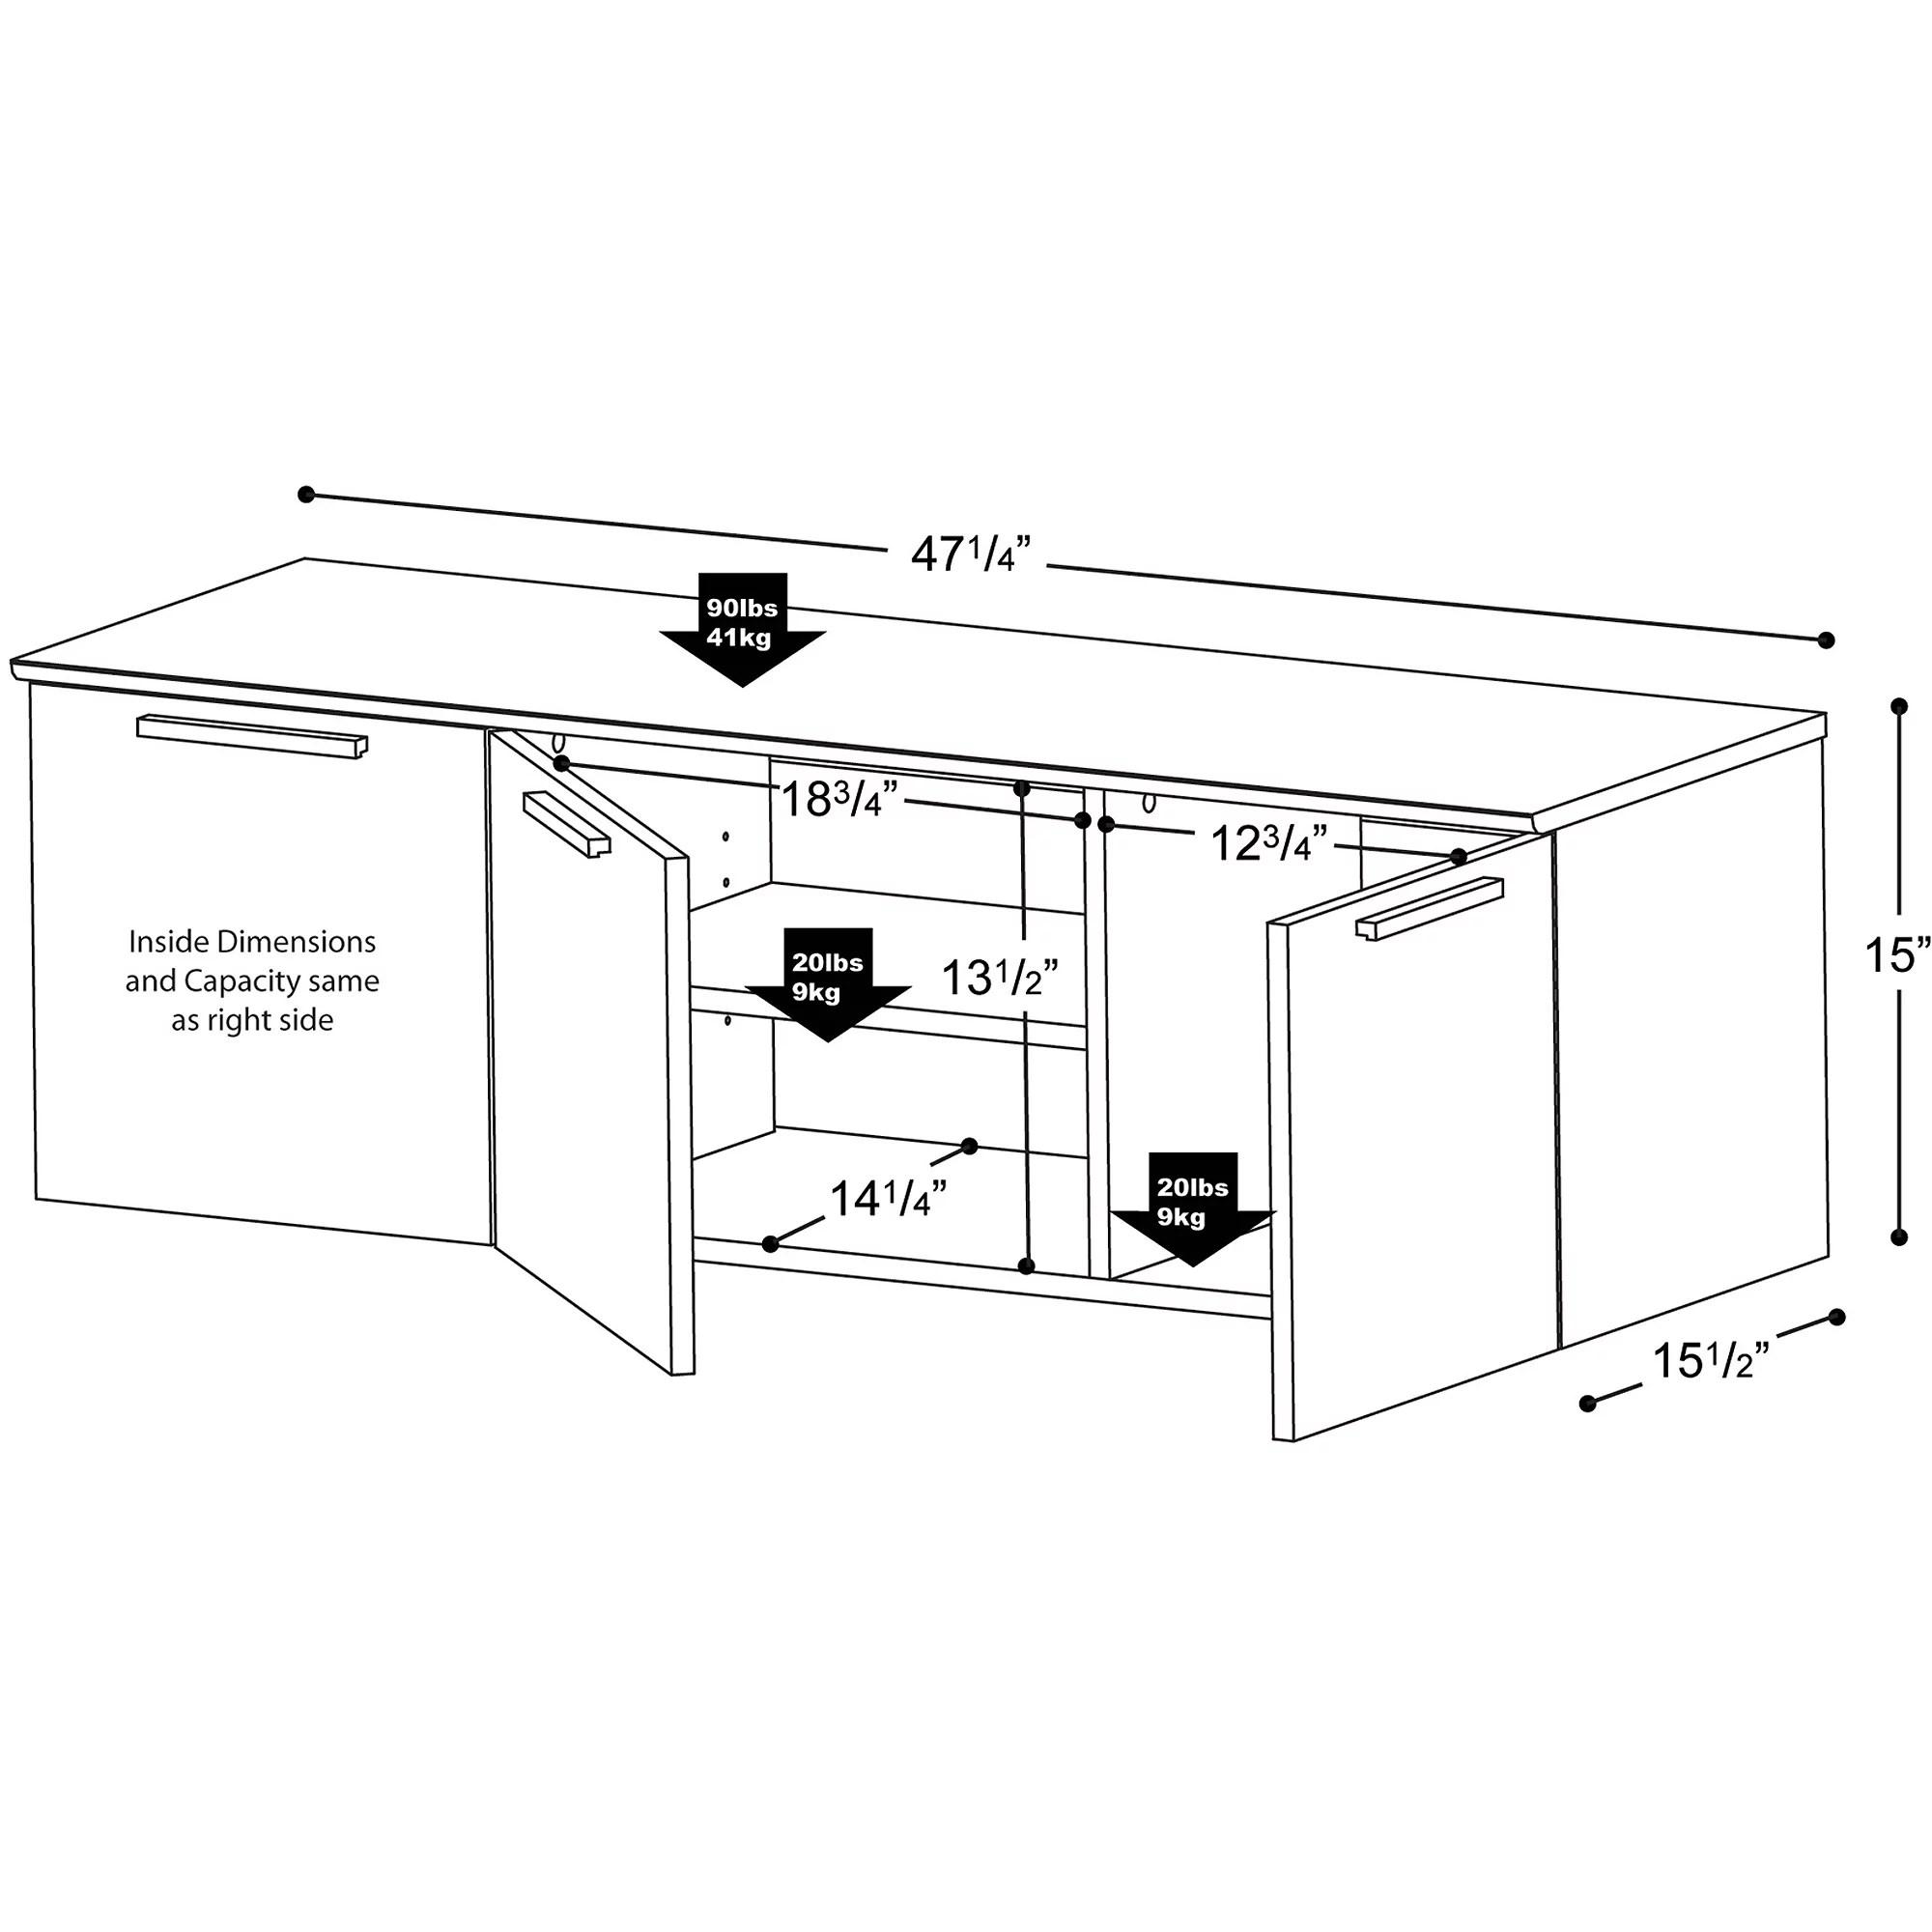 Ih 856 Wiring Diagram